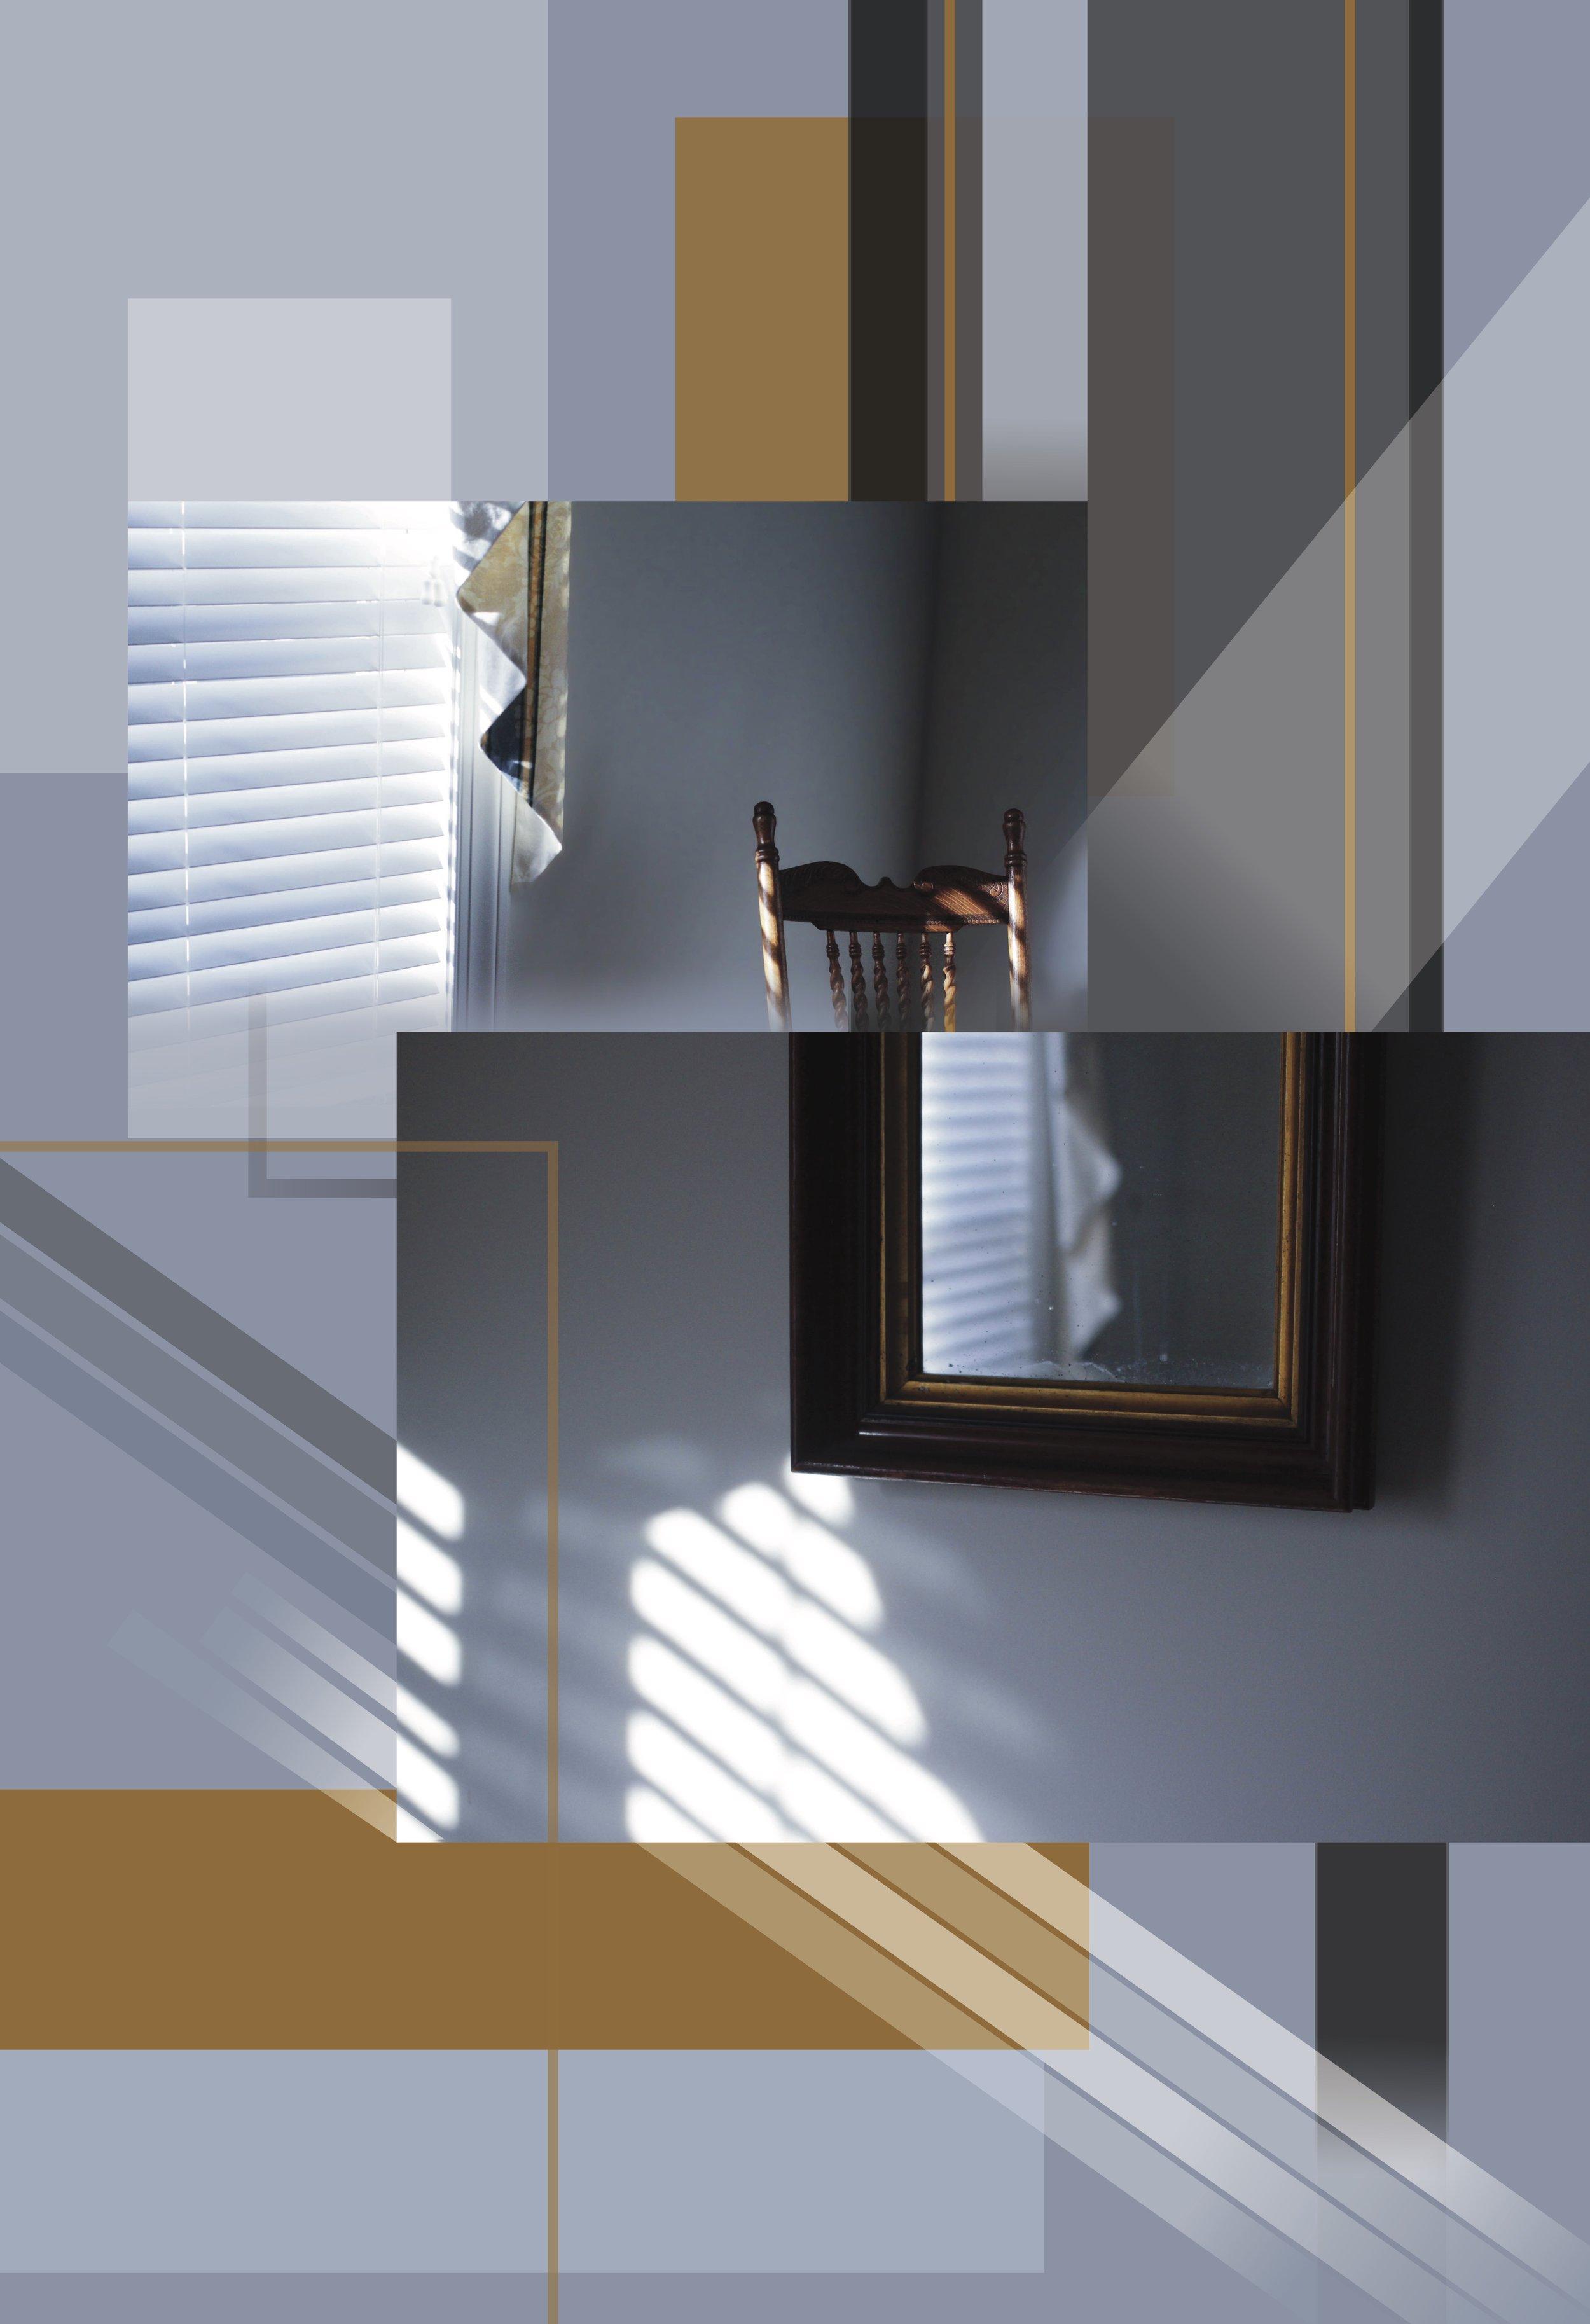 MirrorShapeStudy2.jpg